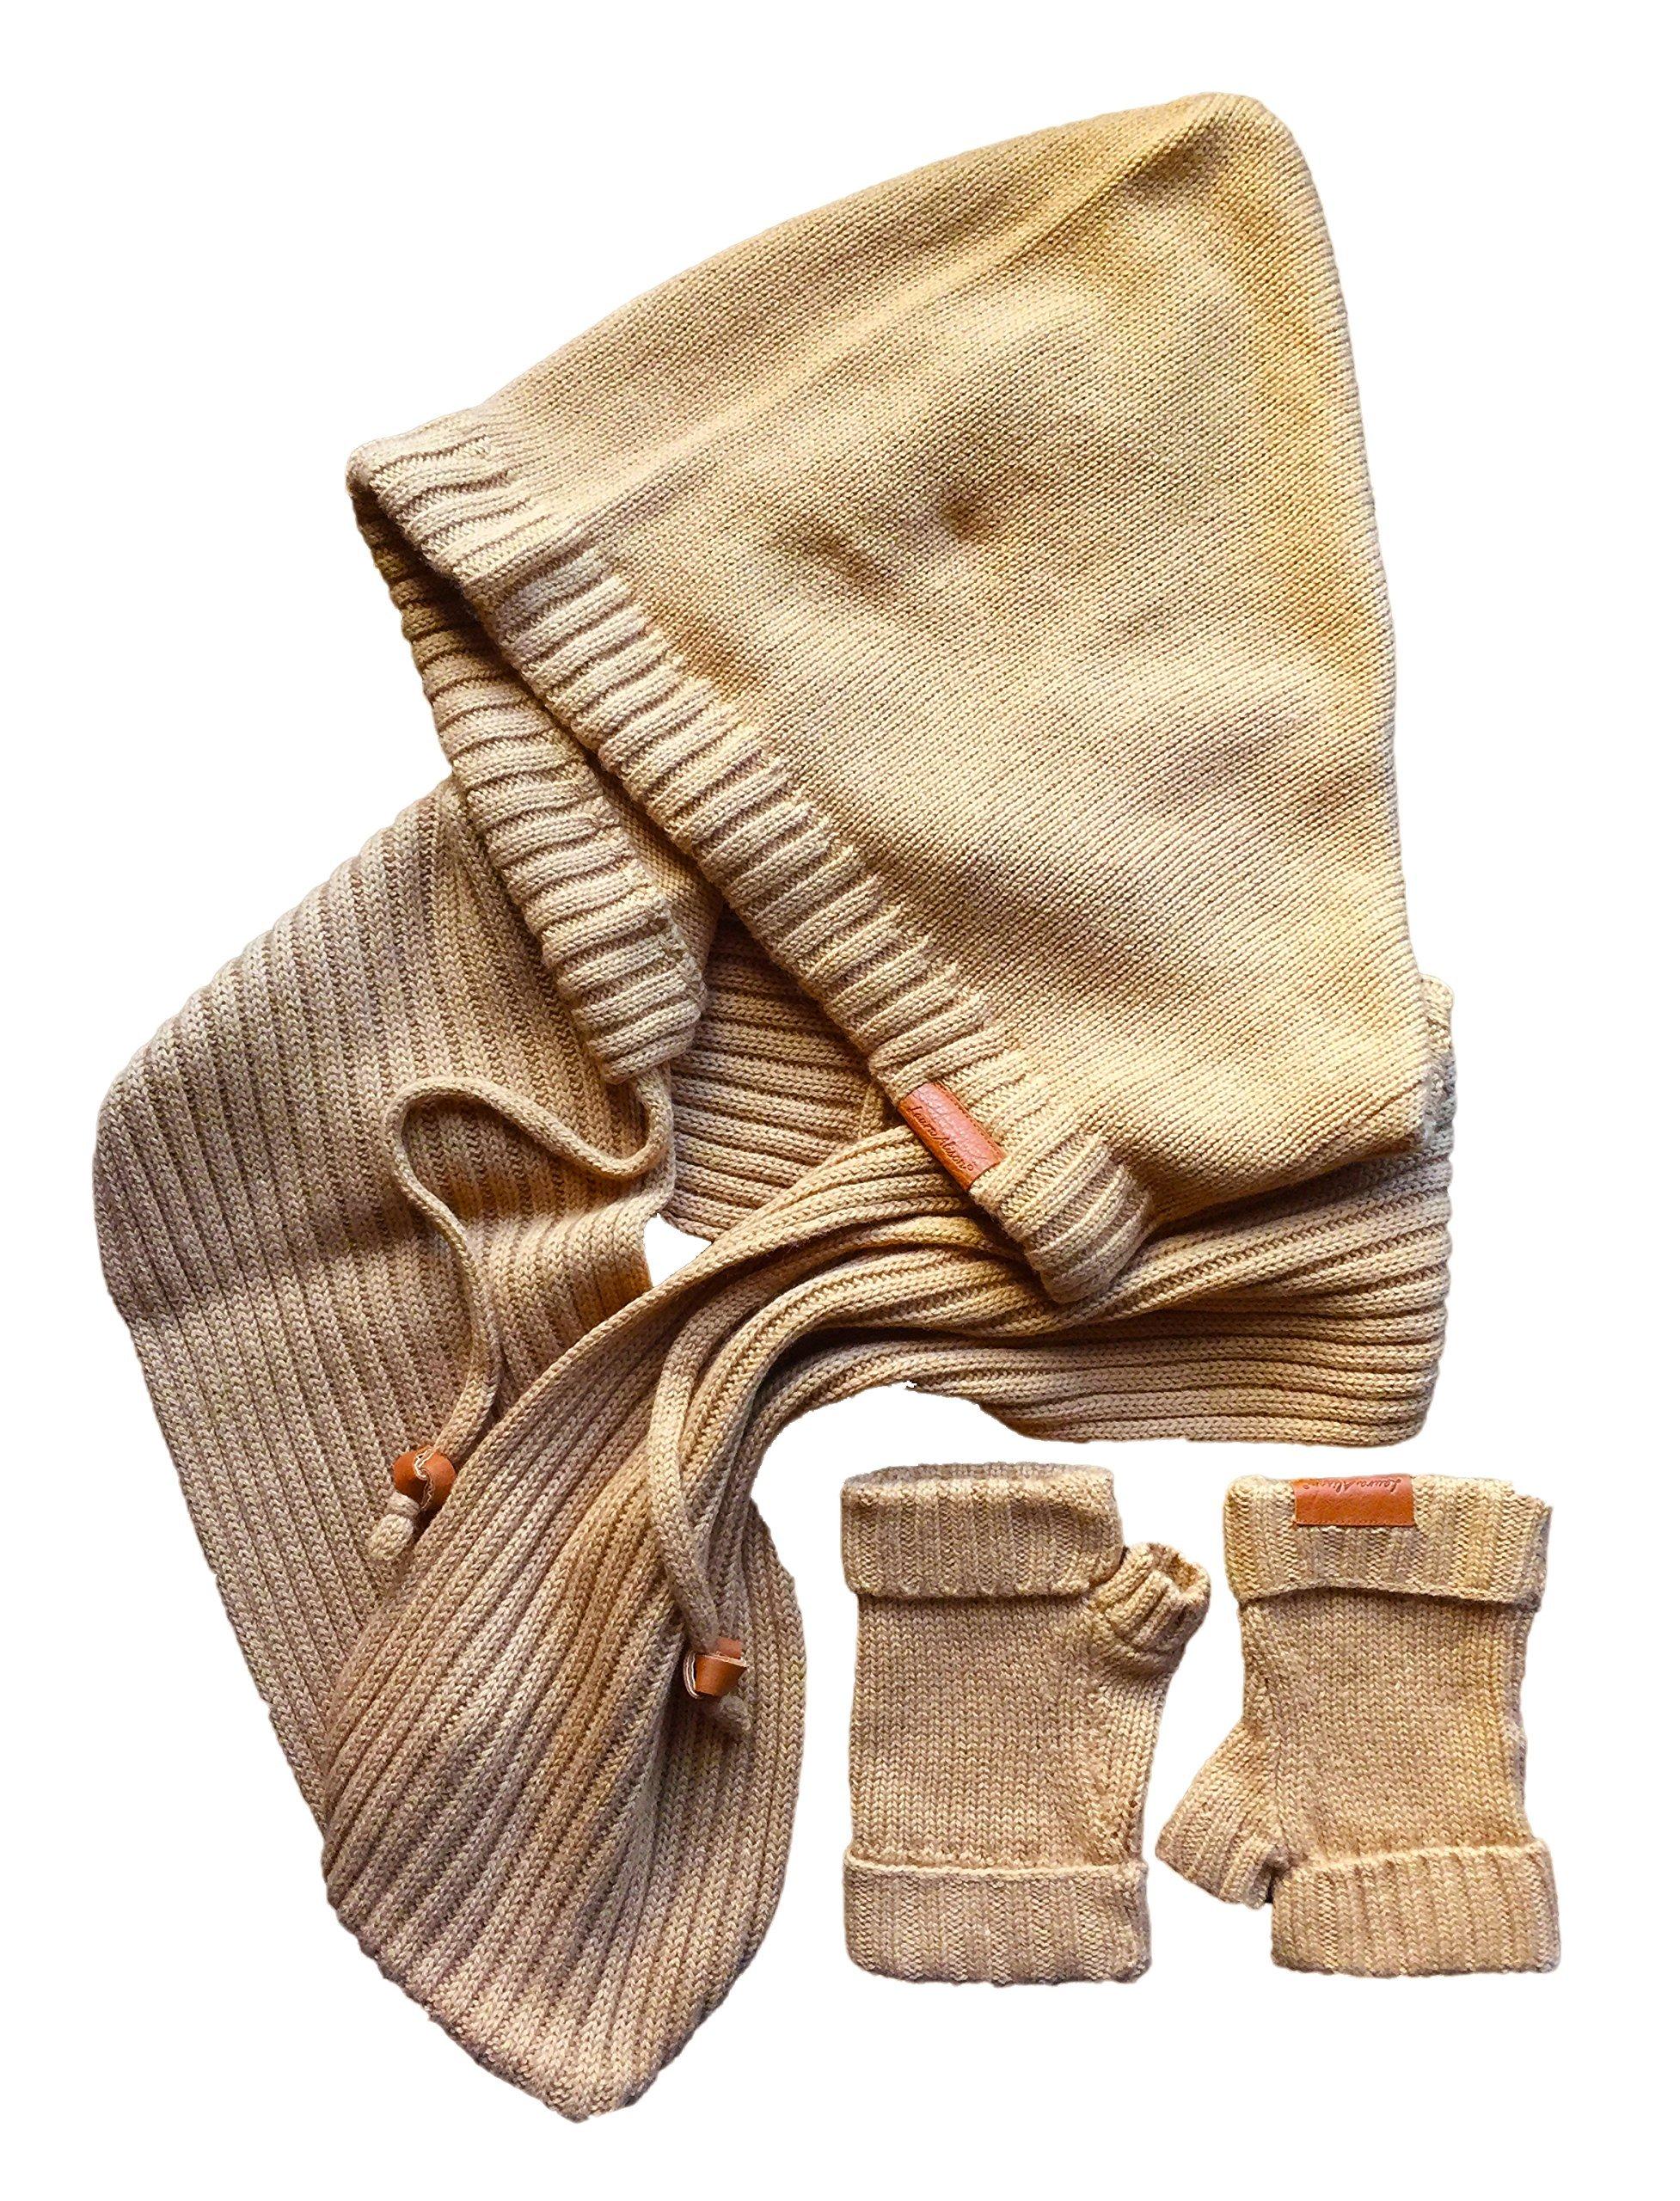 Laura Alison Hooded Infinity Scarf and Fingerless Gloves Gift Set, Koi/Camel